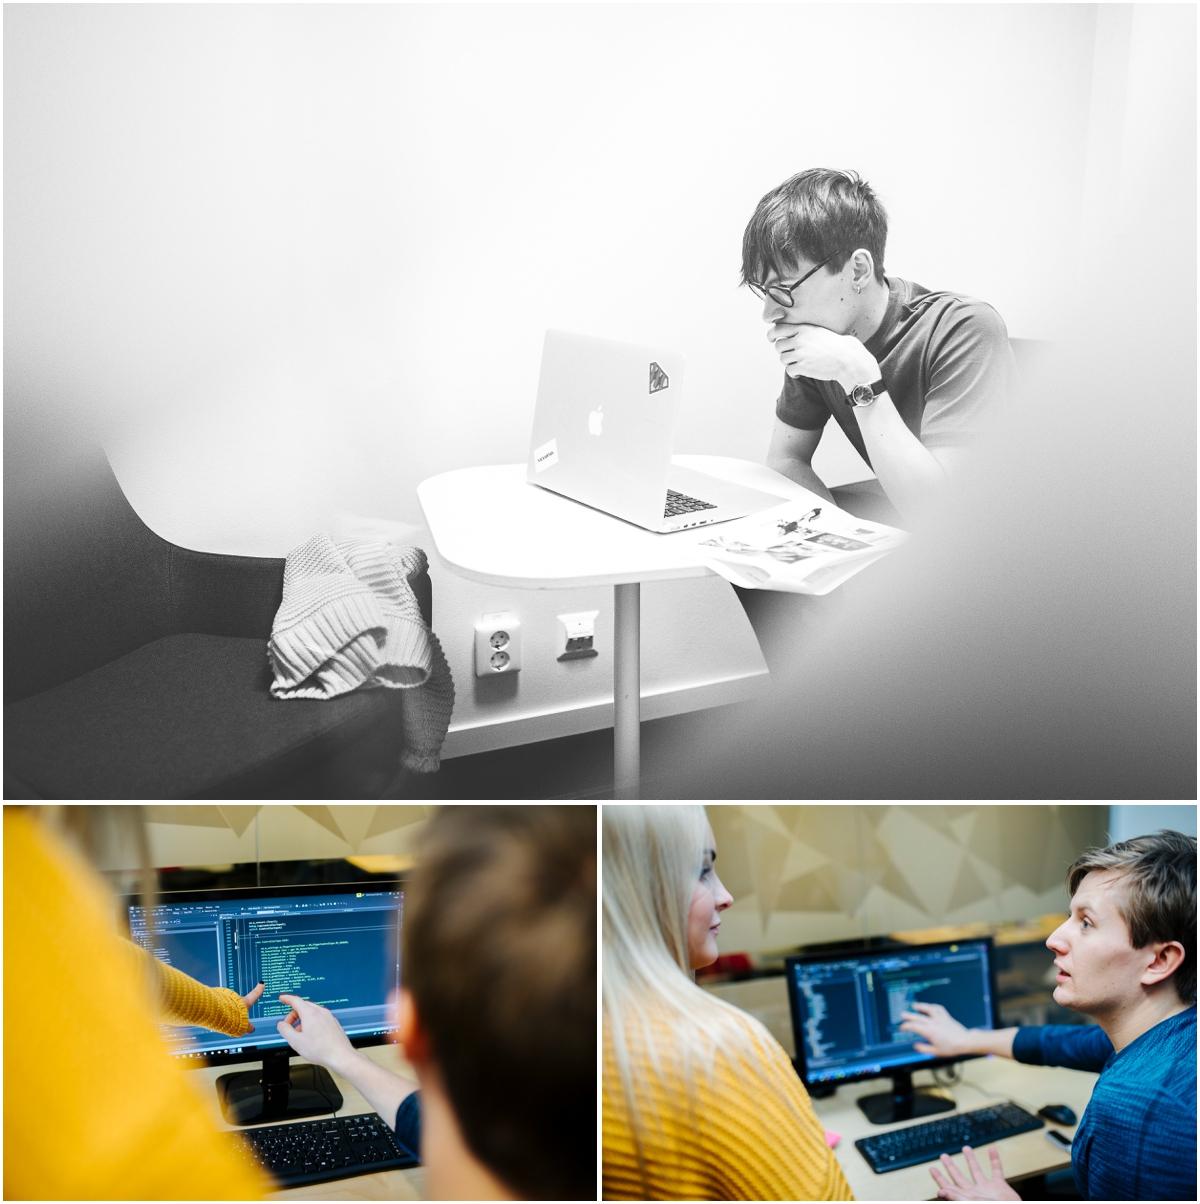 360You-photography-foretagsfotograf-foretagsportratt-stockholm-vallentuna-taby-bildbank-nackademin-5.jpg